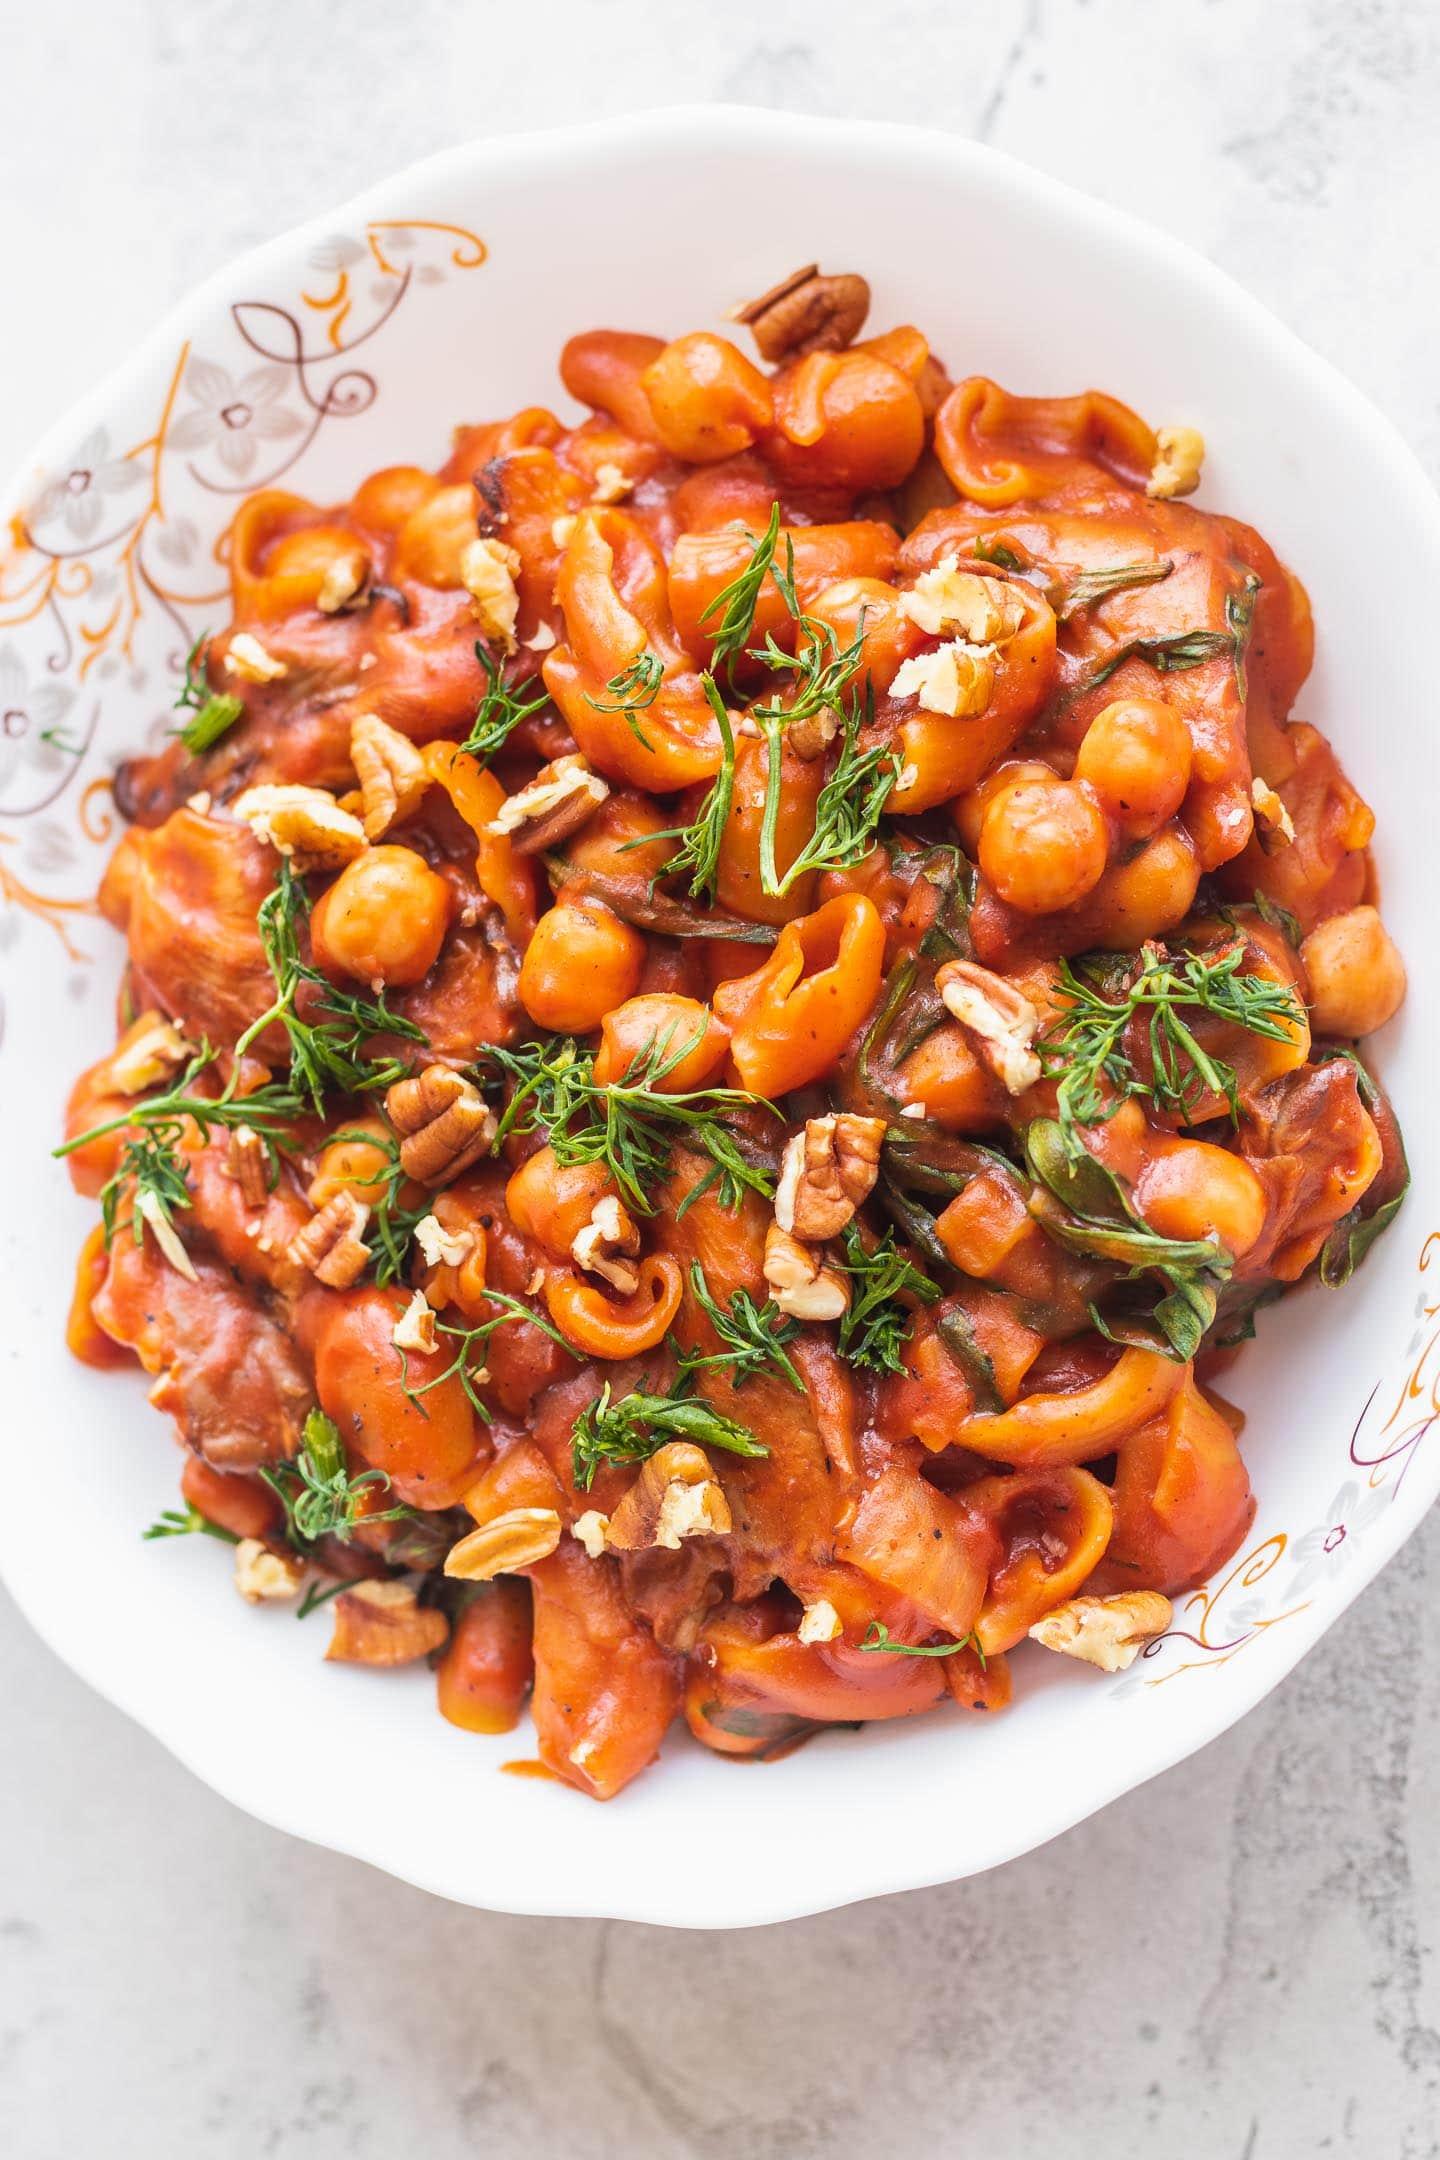 Vegan one-pot chickpea pasta gluten-free